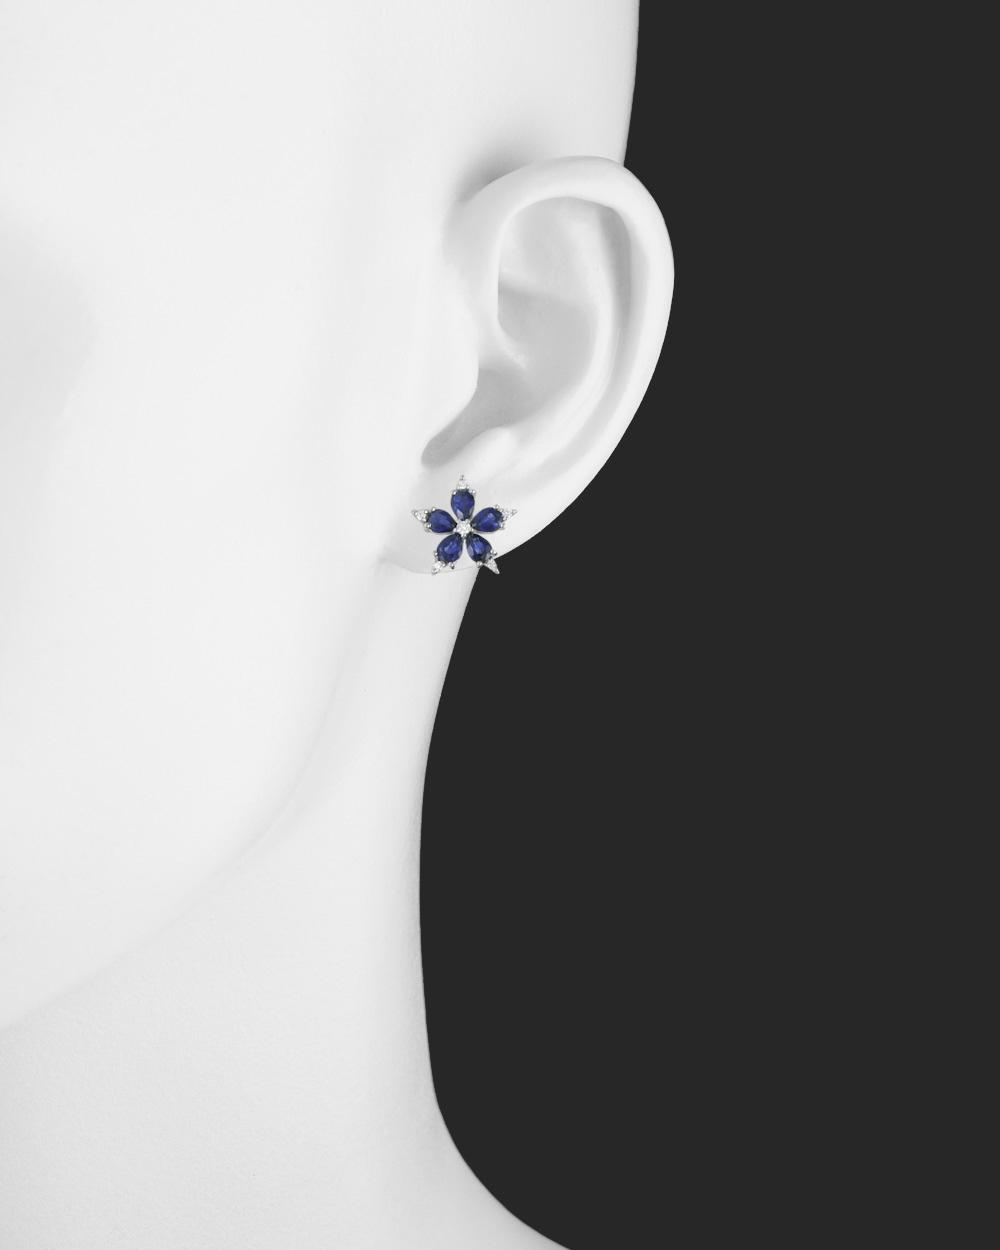 aa1e51fd29ab7 Women's Small Sapphire & Diamond